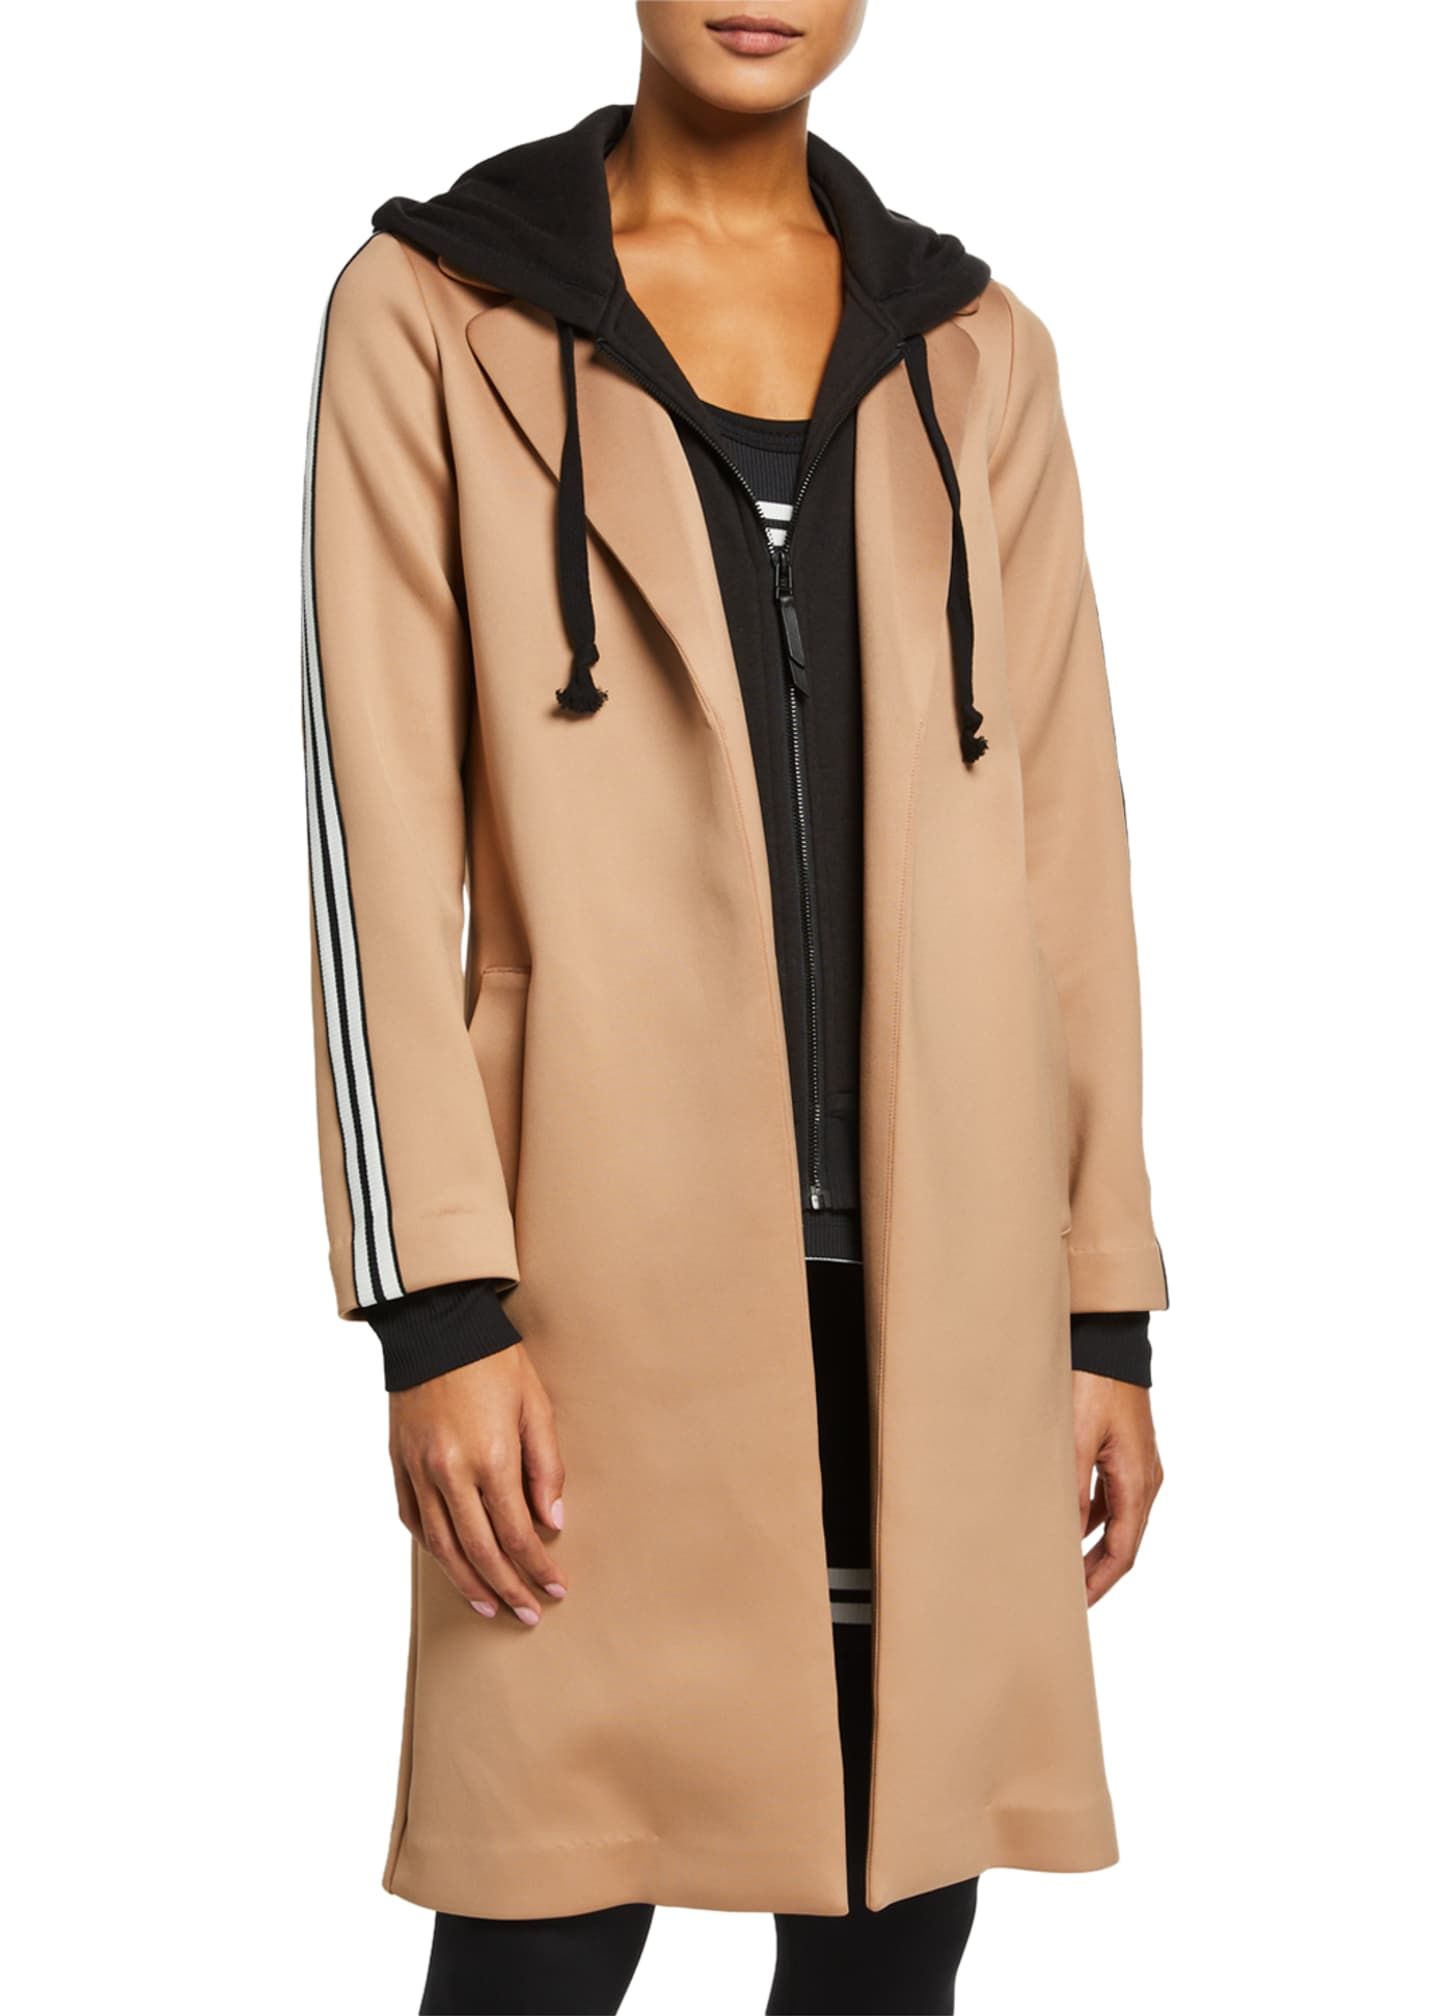 Lukka Lux The Nayomi Layered Side-Stripe Jacket